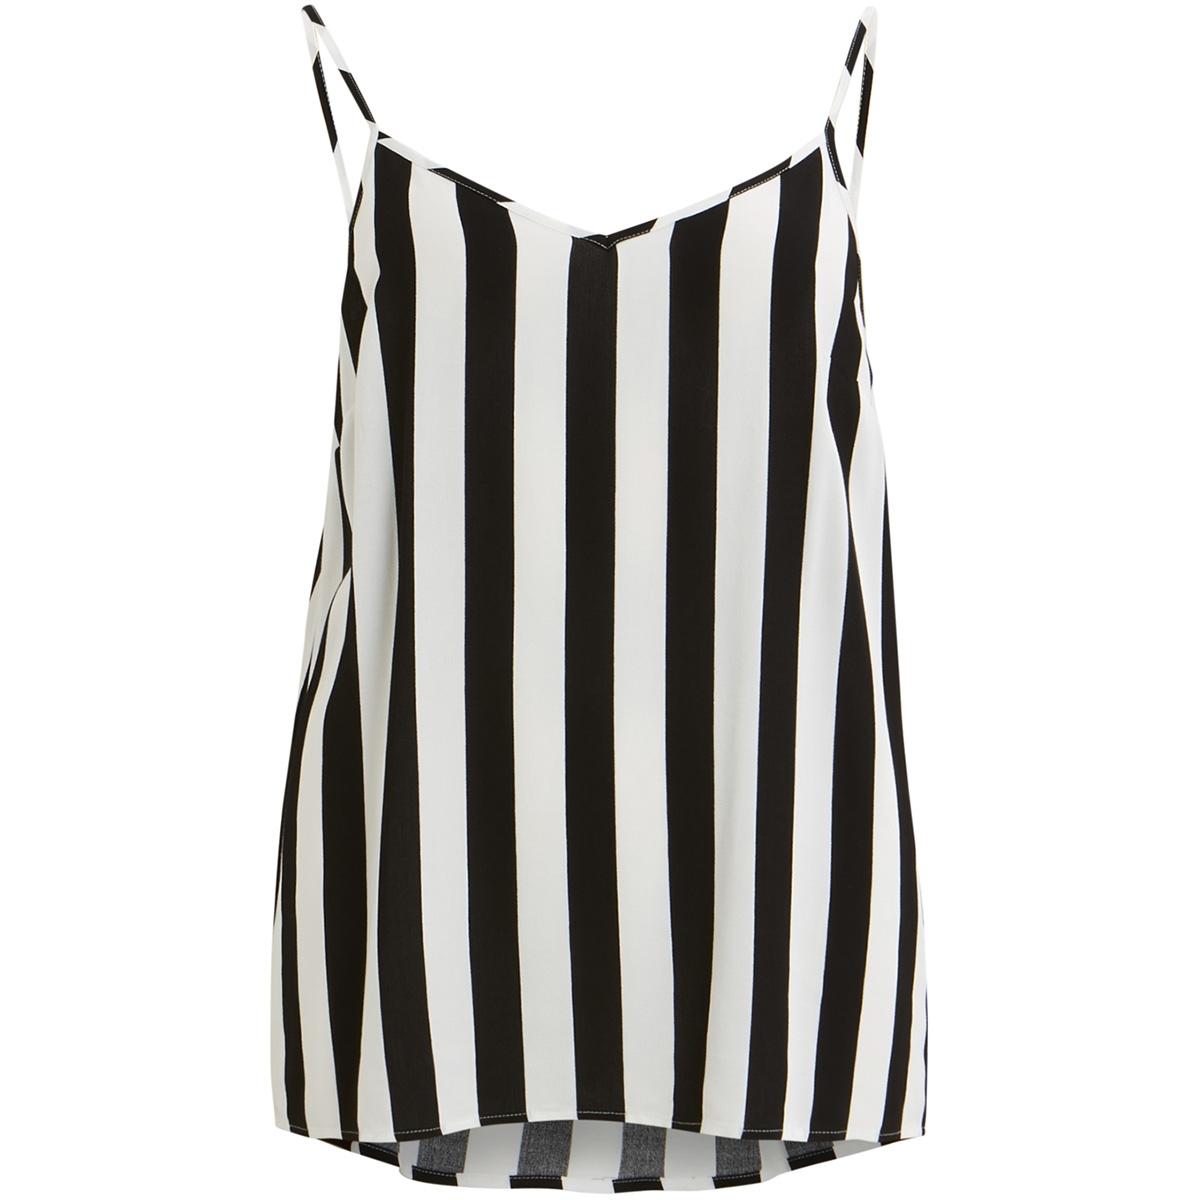 objbay s/l slip top aop 101 23029367 object top black/w. white stripes